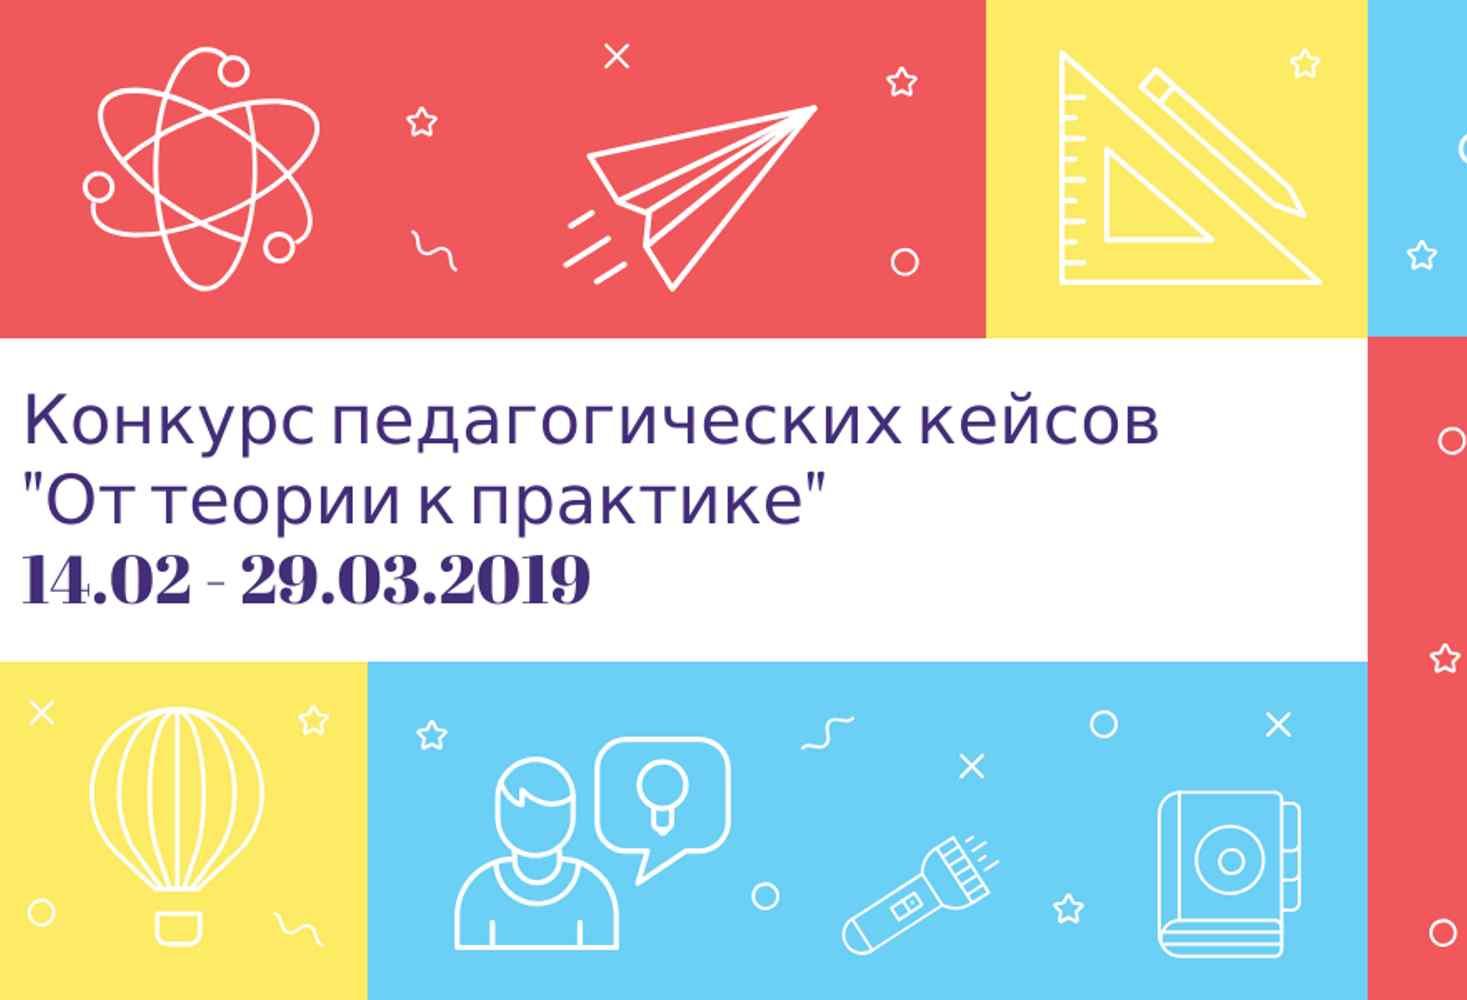 moj-universitet-obyavil-o-starte-konkursa-pedagogicheskih-kejsov-ot-teorii-k-praktike